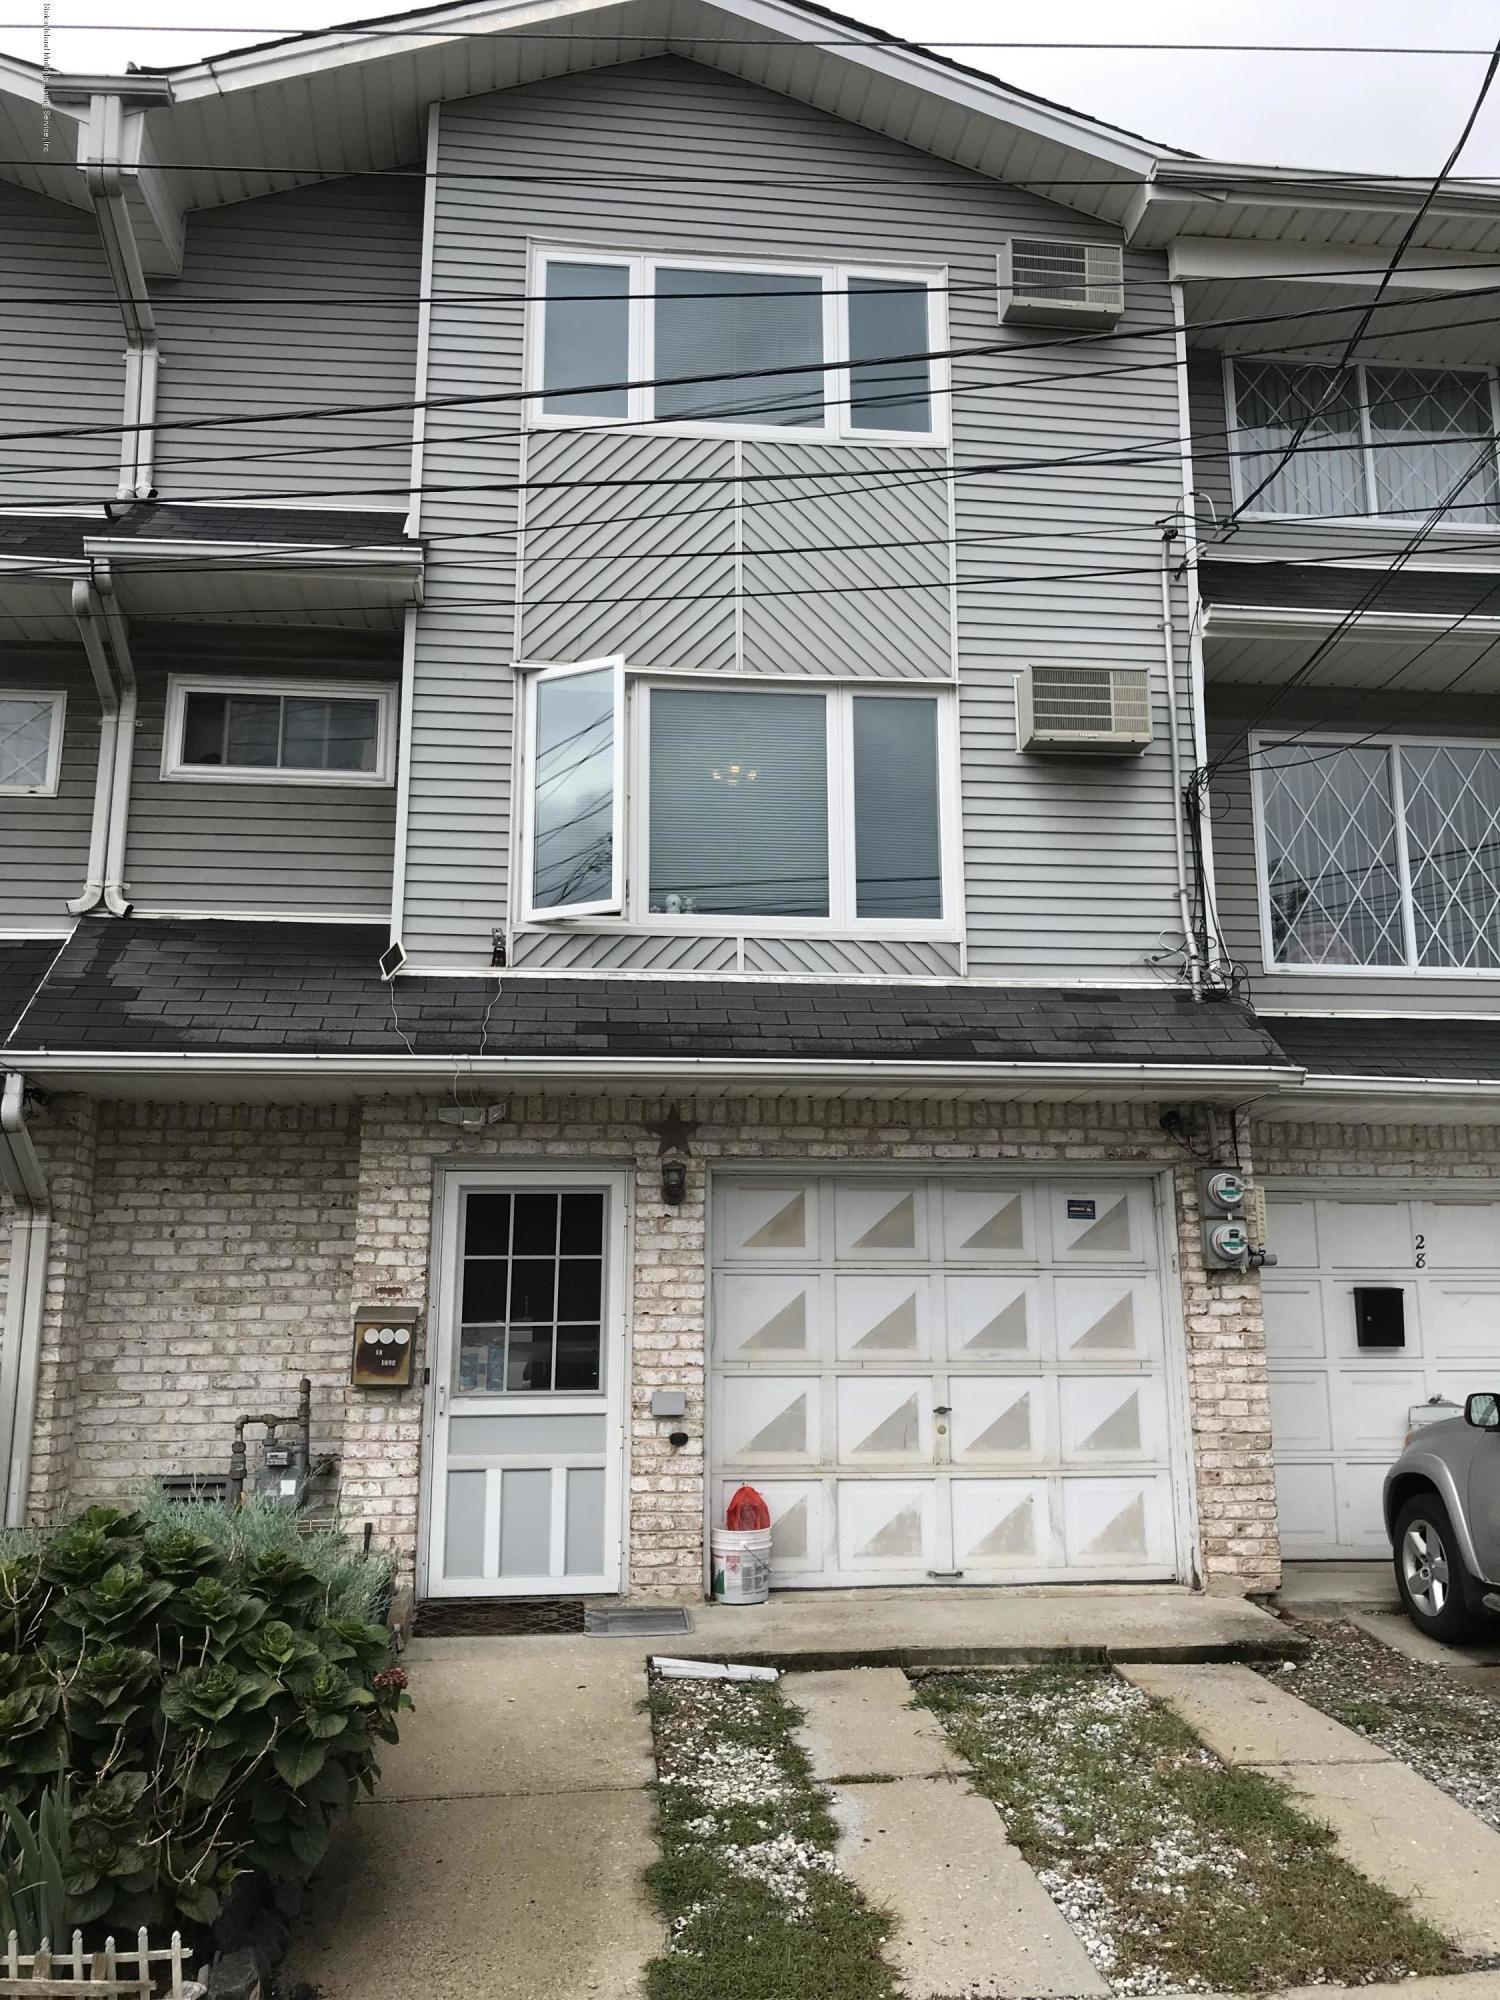 Single Family - Attached 30 Smith Street  Staten Island, NY 10305, MLS-1132098-2